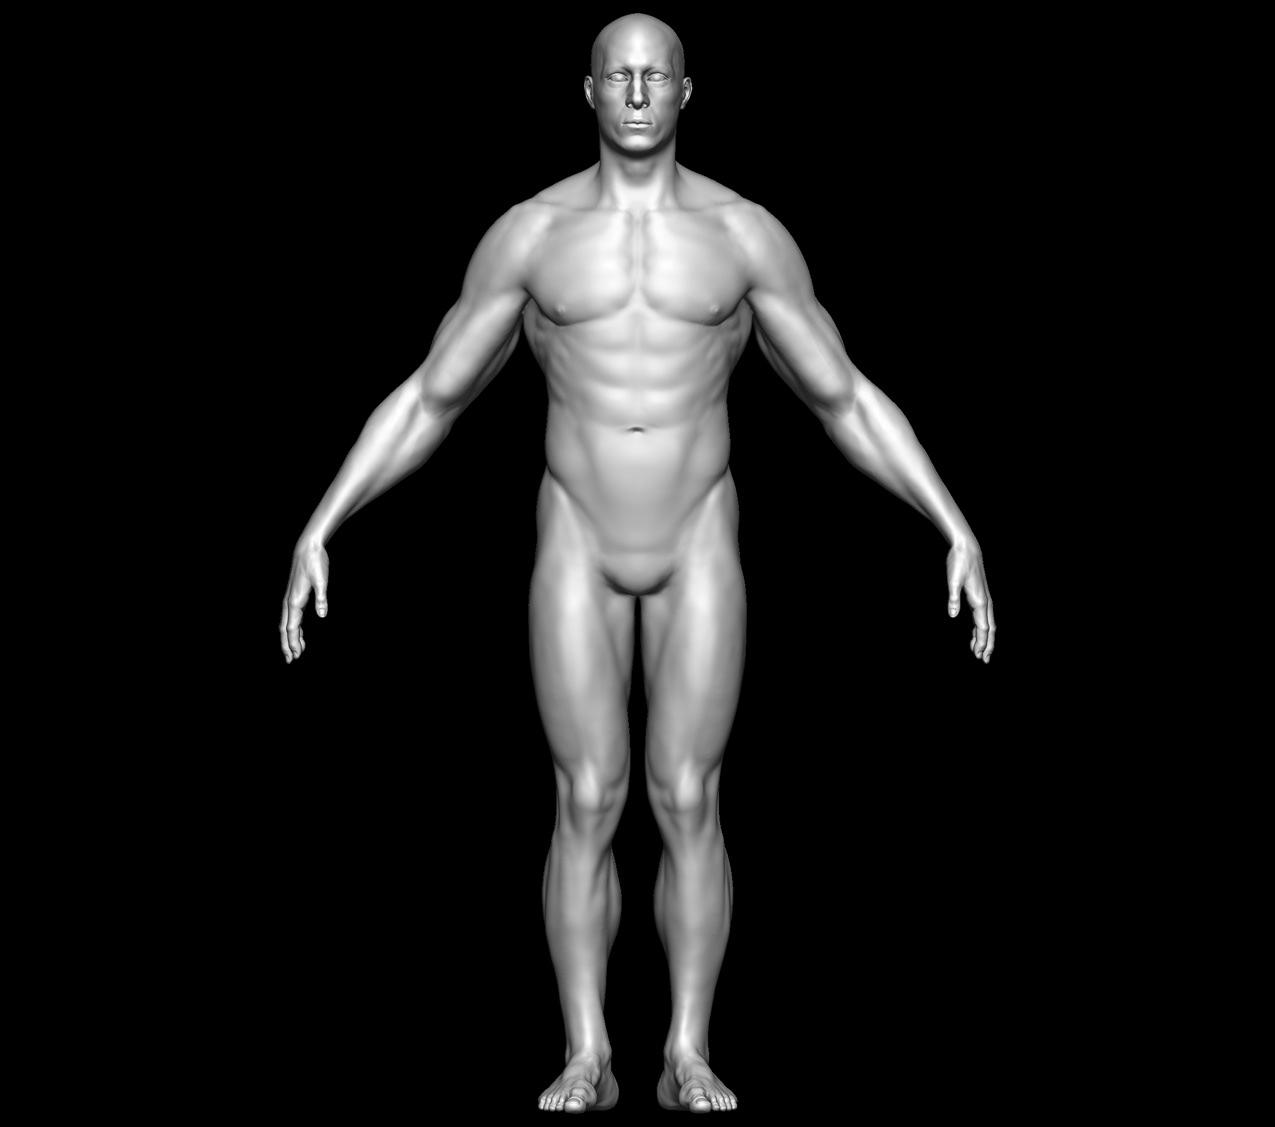 damon bard character creature visual development design male